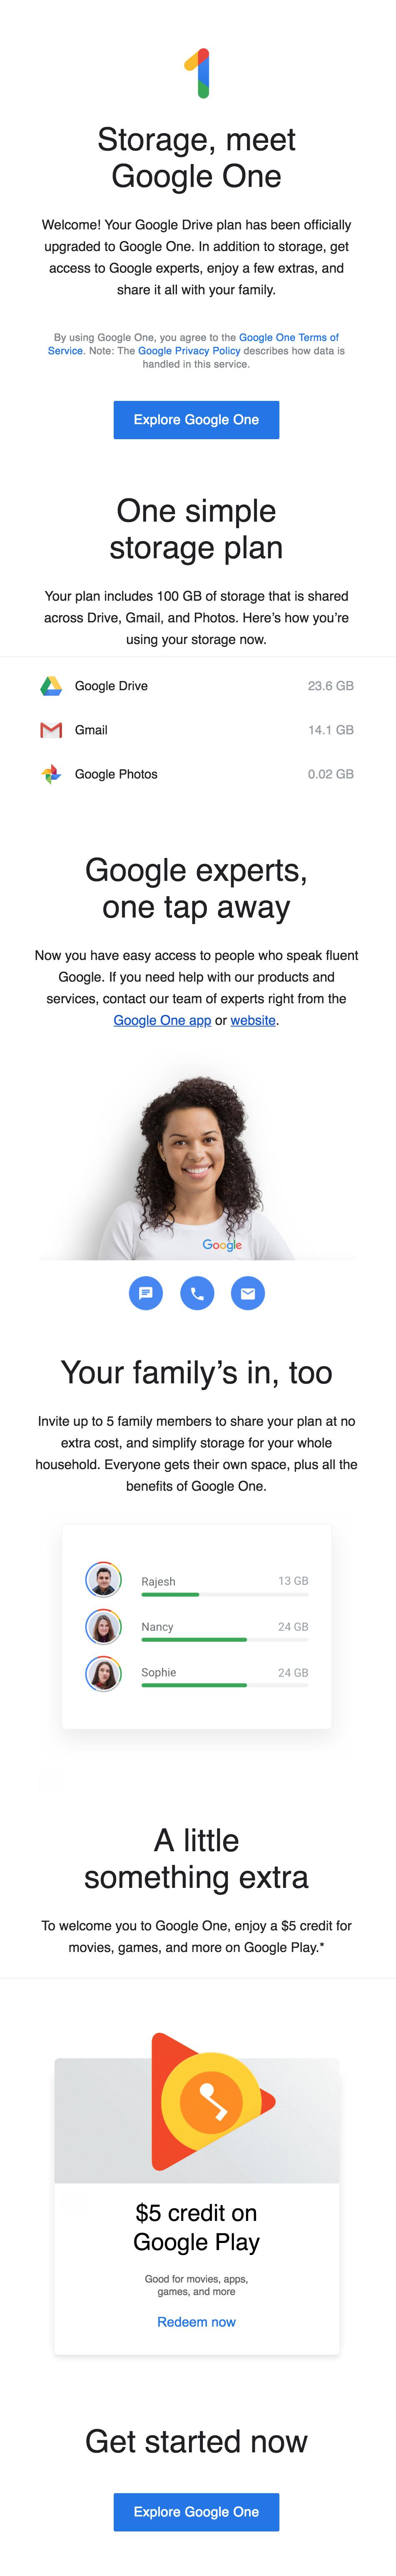 google-email-1 (1).jpg